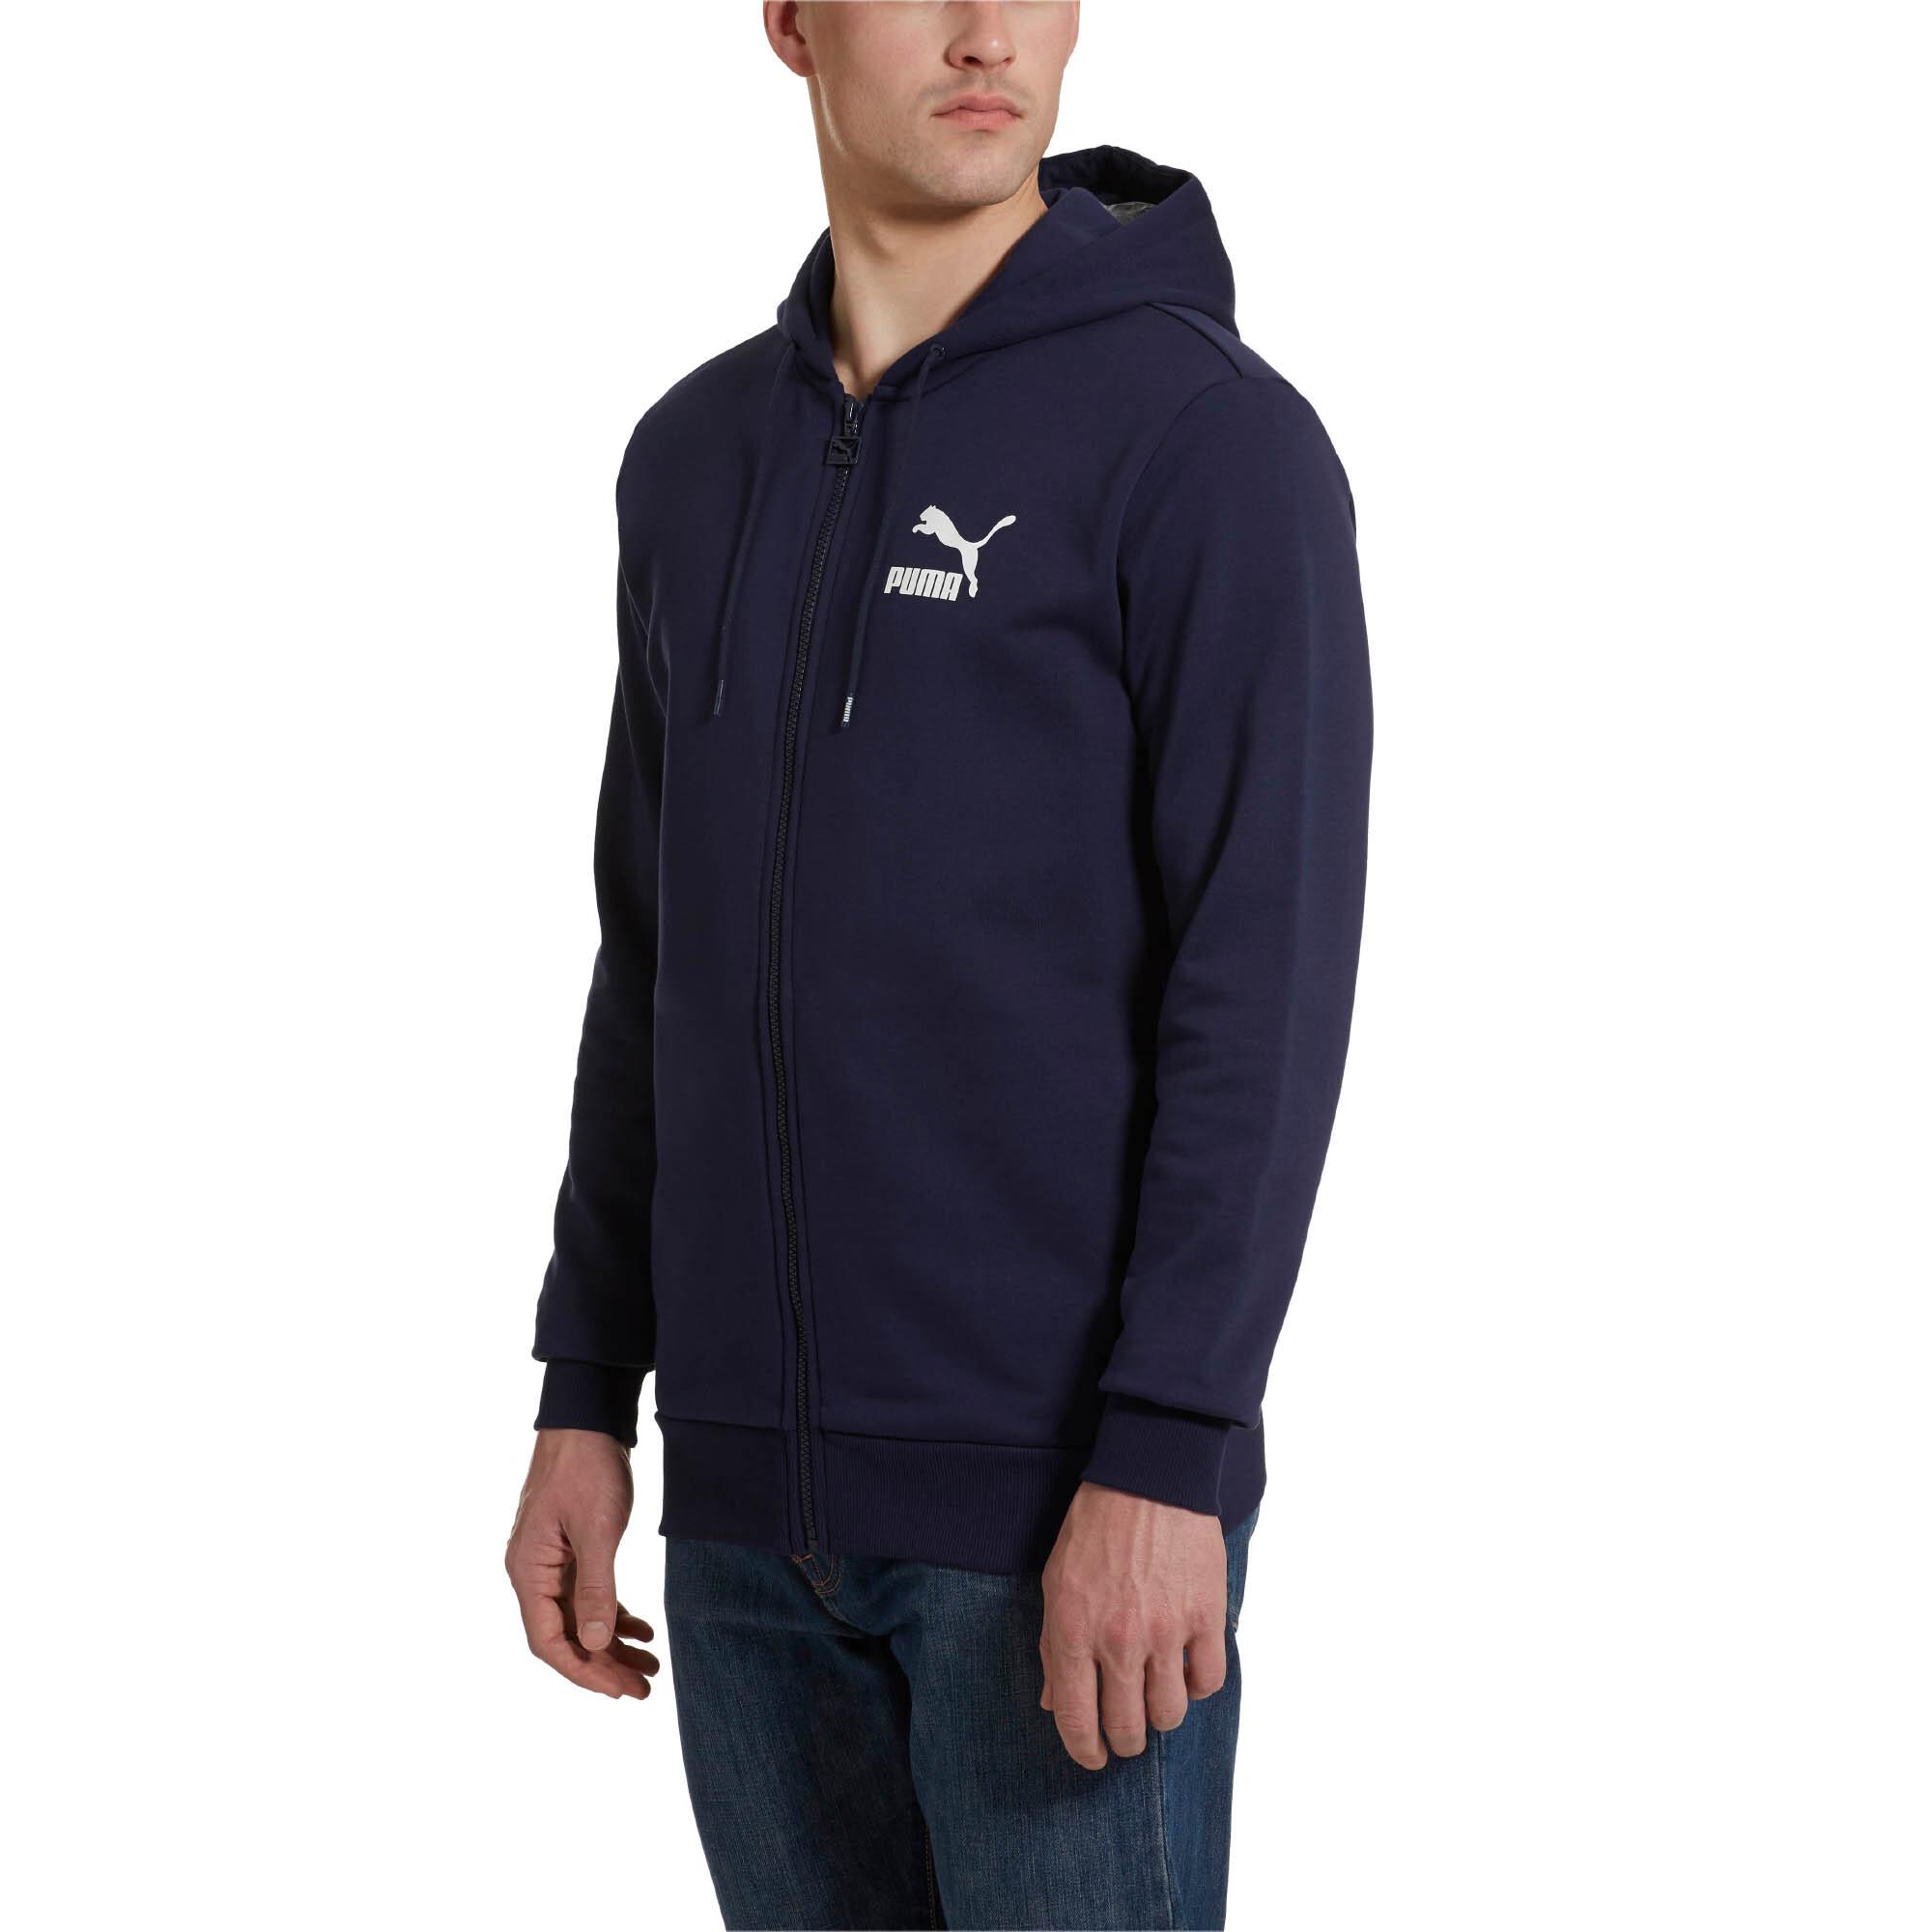 PUMA-Classics-Men-s-Full-Zip-Logo-Hoodie-Men-Sweat-Sport-Classics thumbnail 9